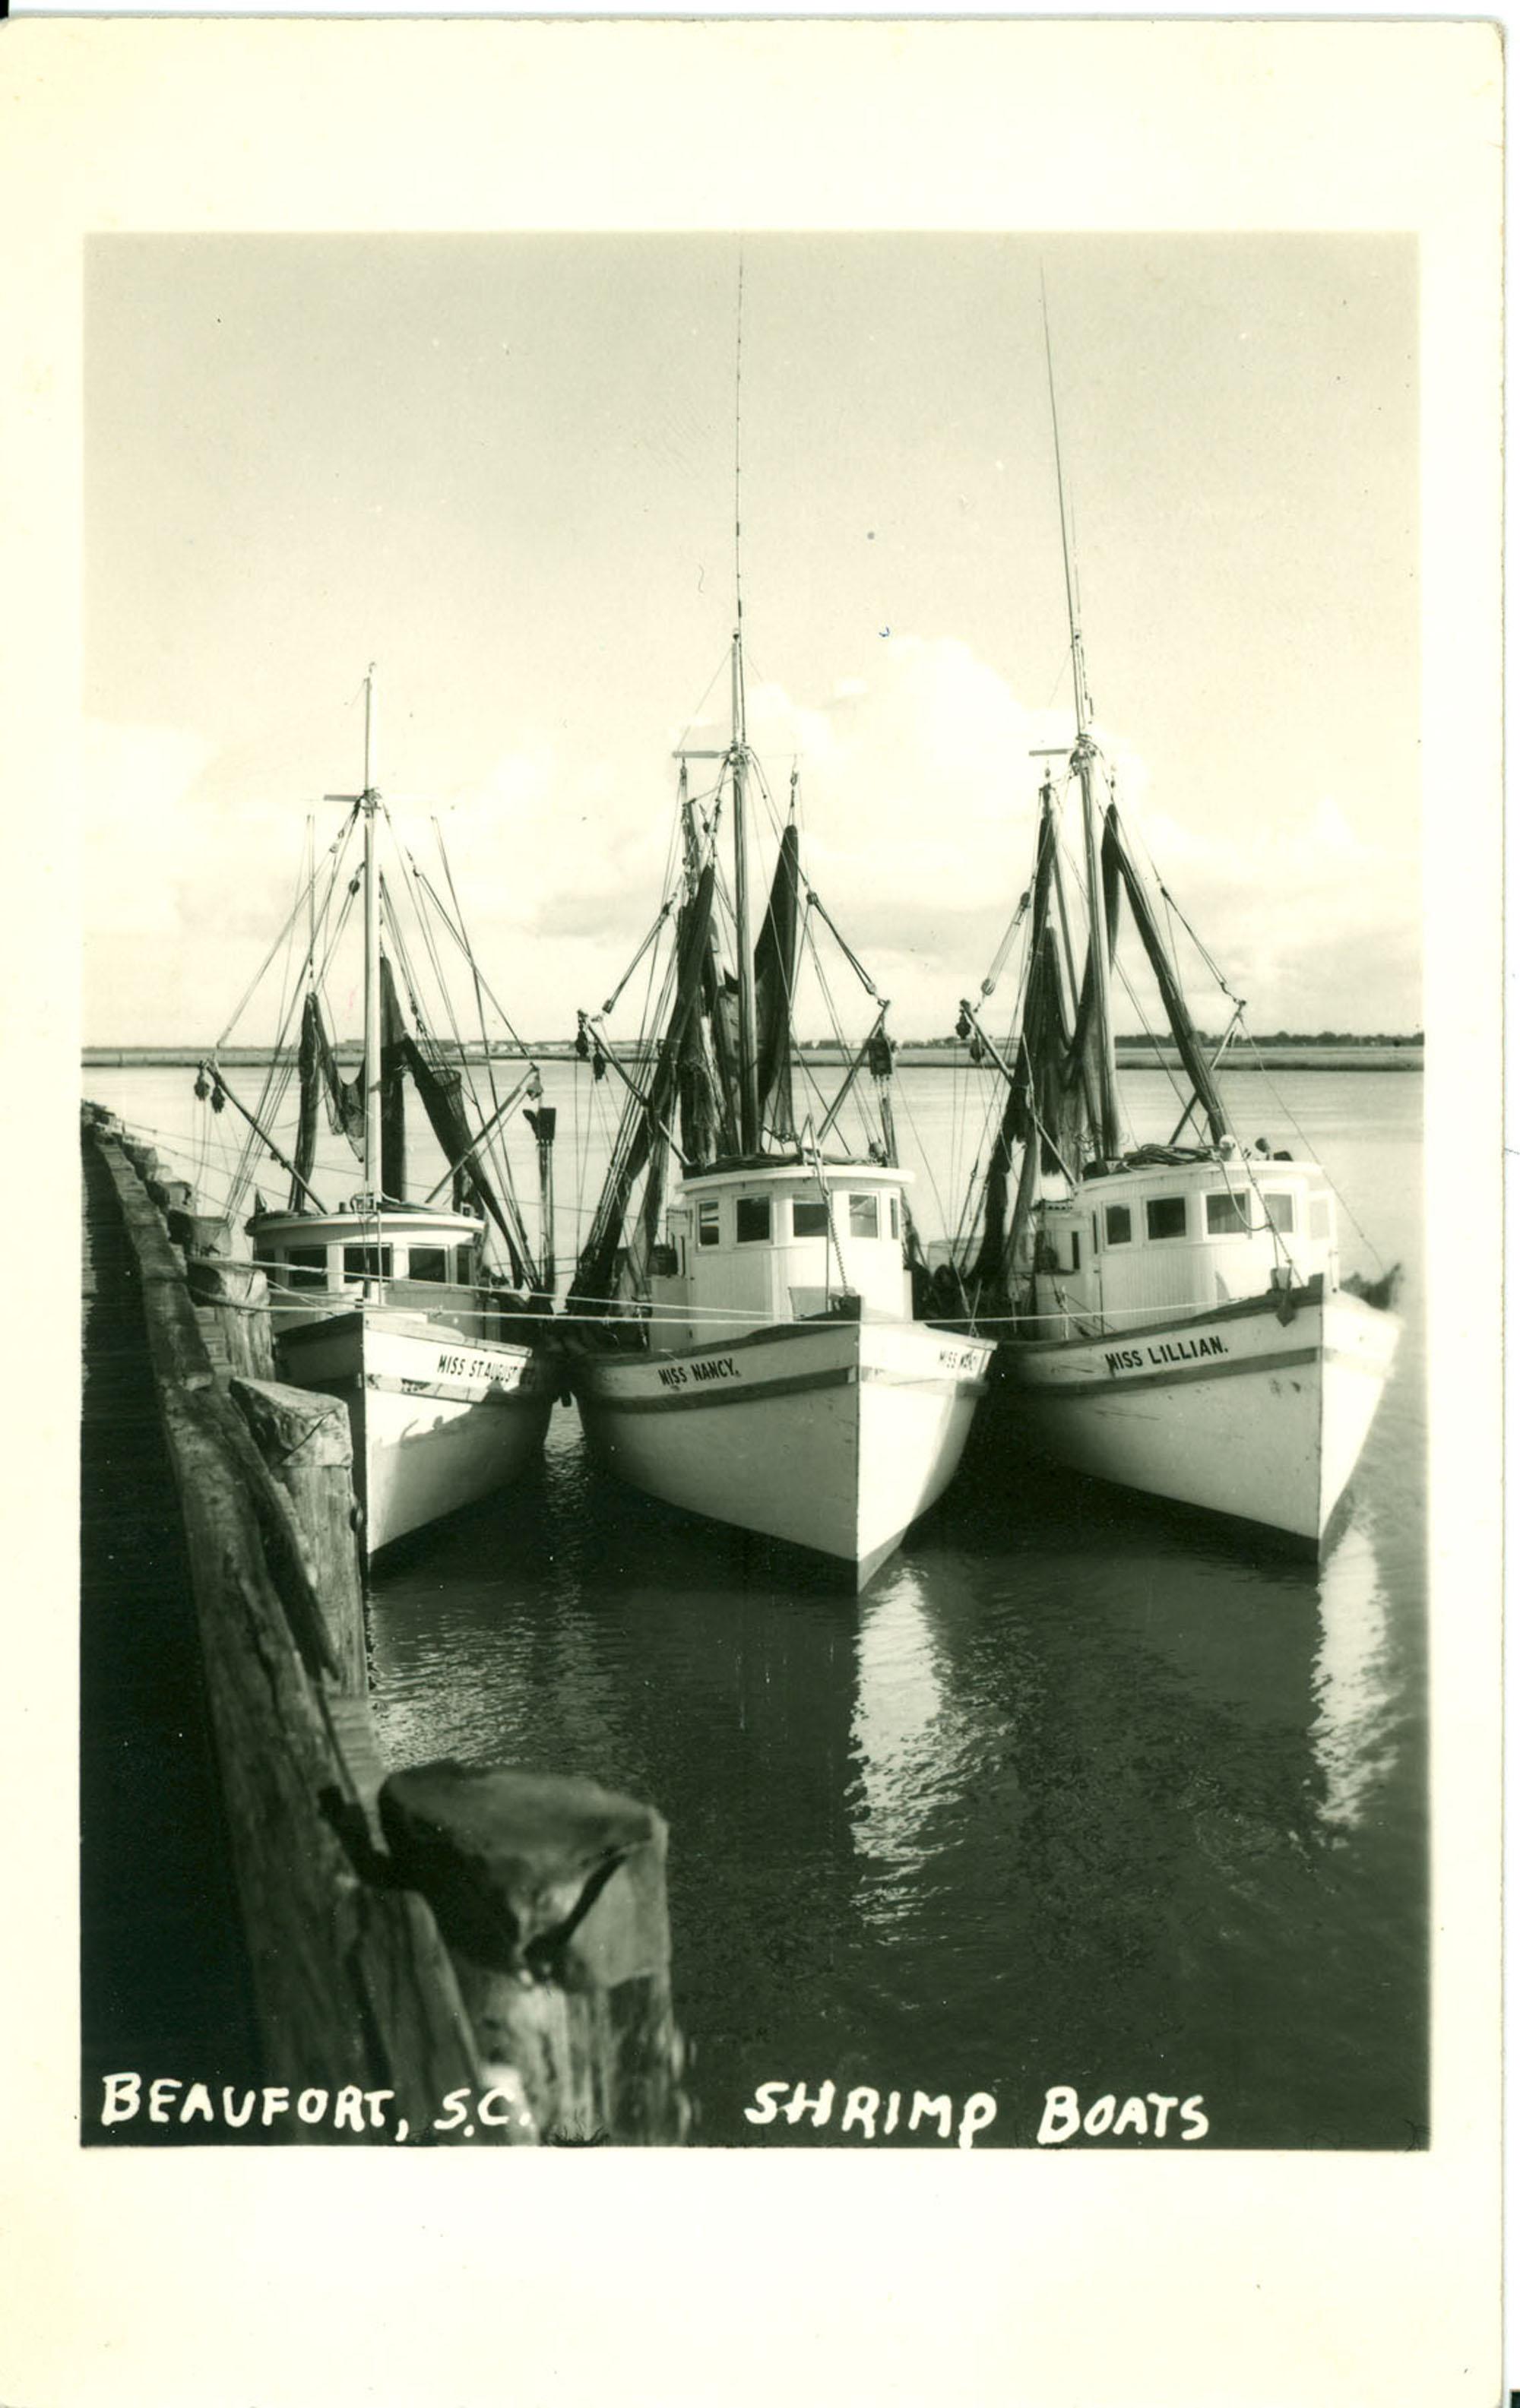 Shrimp Boats Beaufort, S.C.